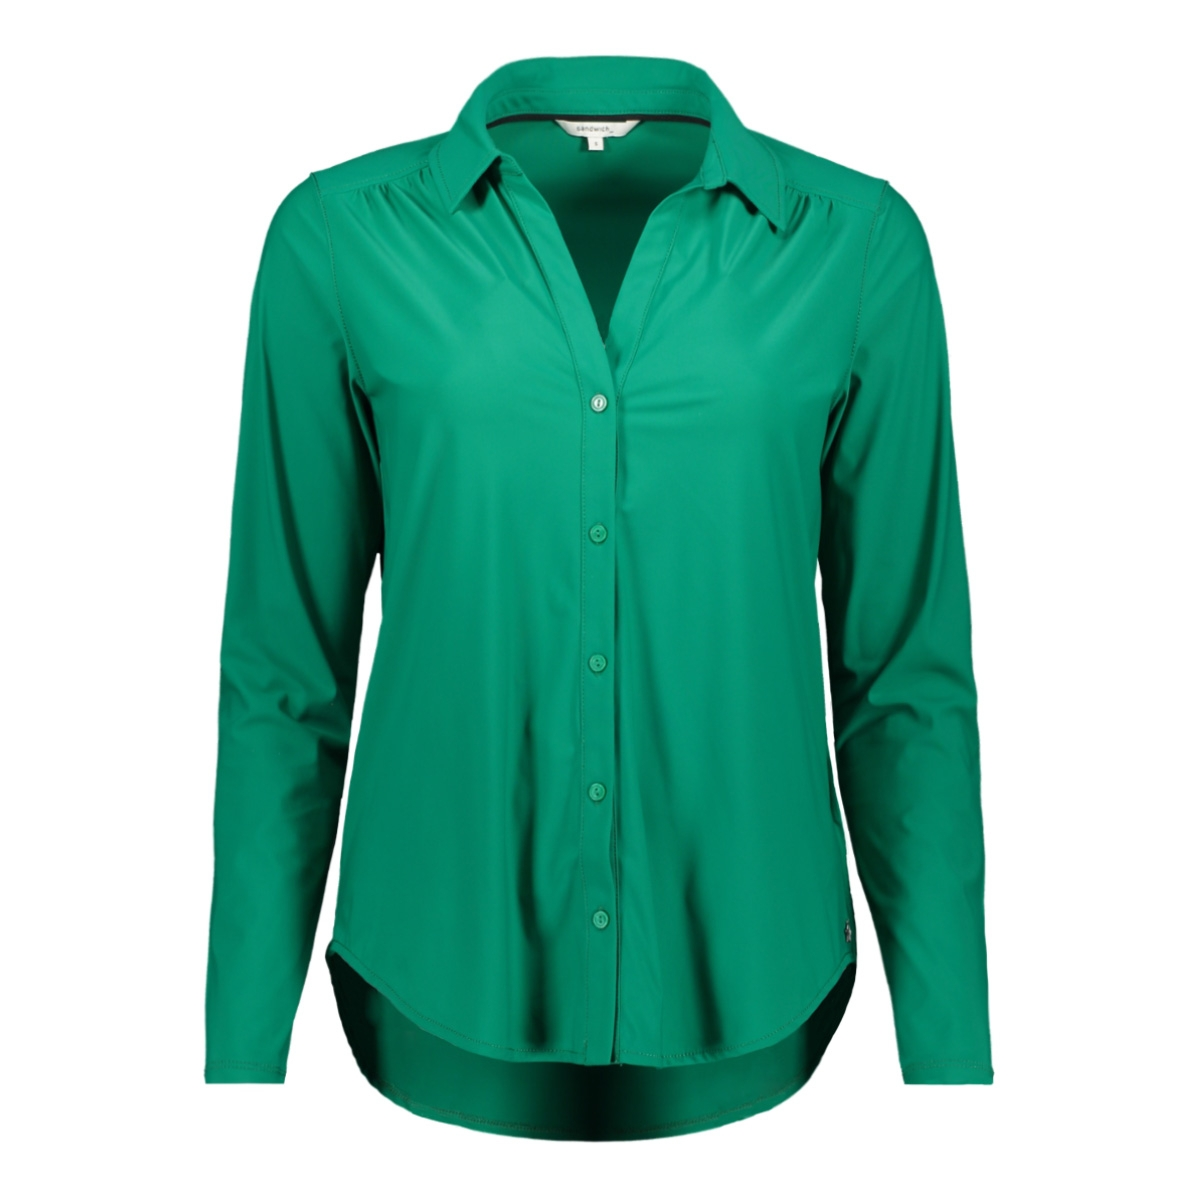 blouse jersey 22001777 sandwich blouse 50018